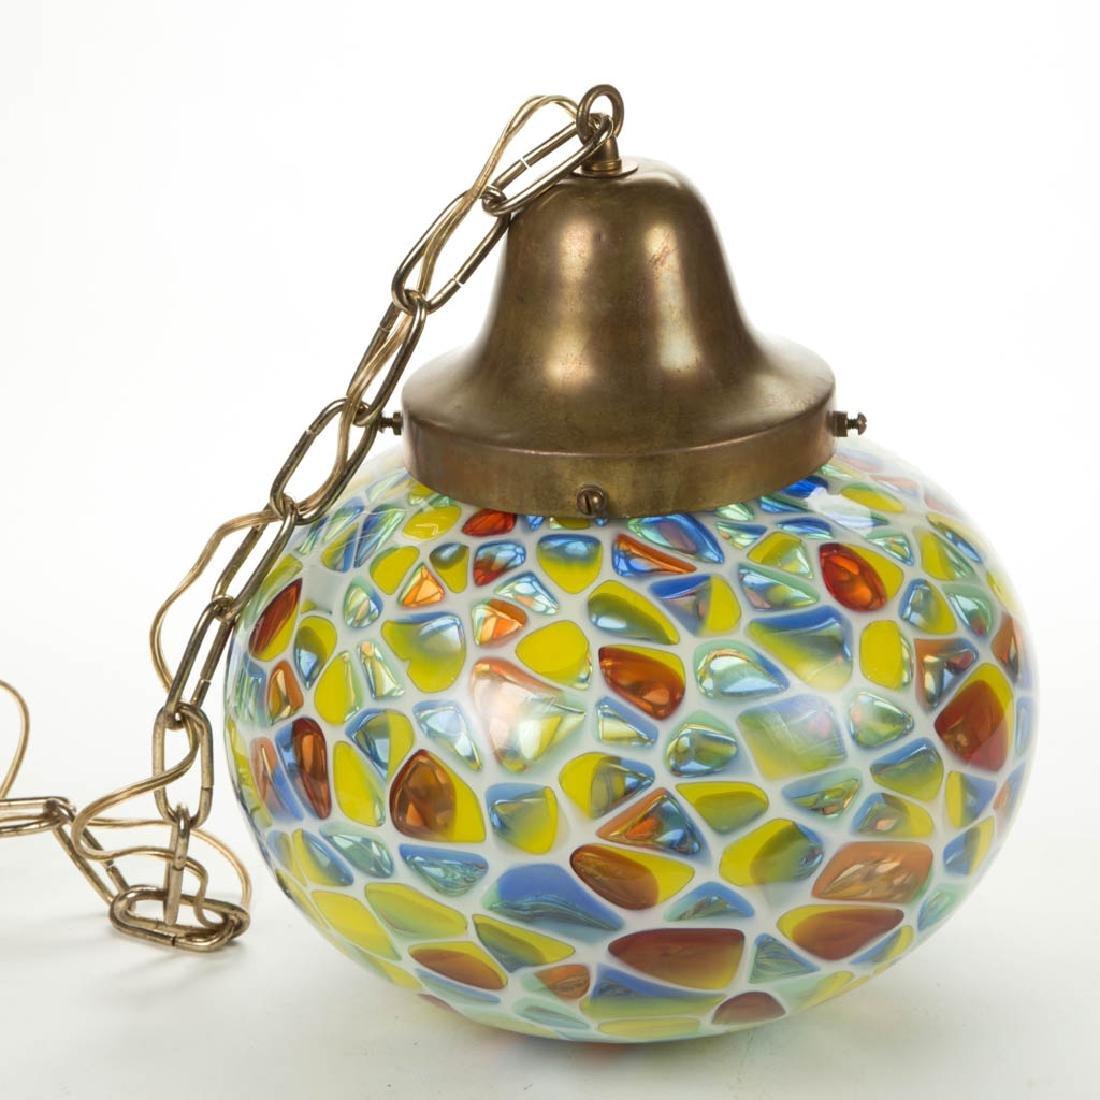 FREE-BLOWN ART GLASS PENDANT HANGING ELECTRIC HALL